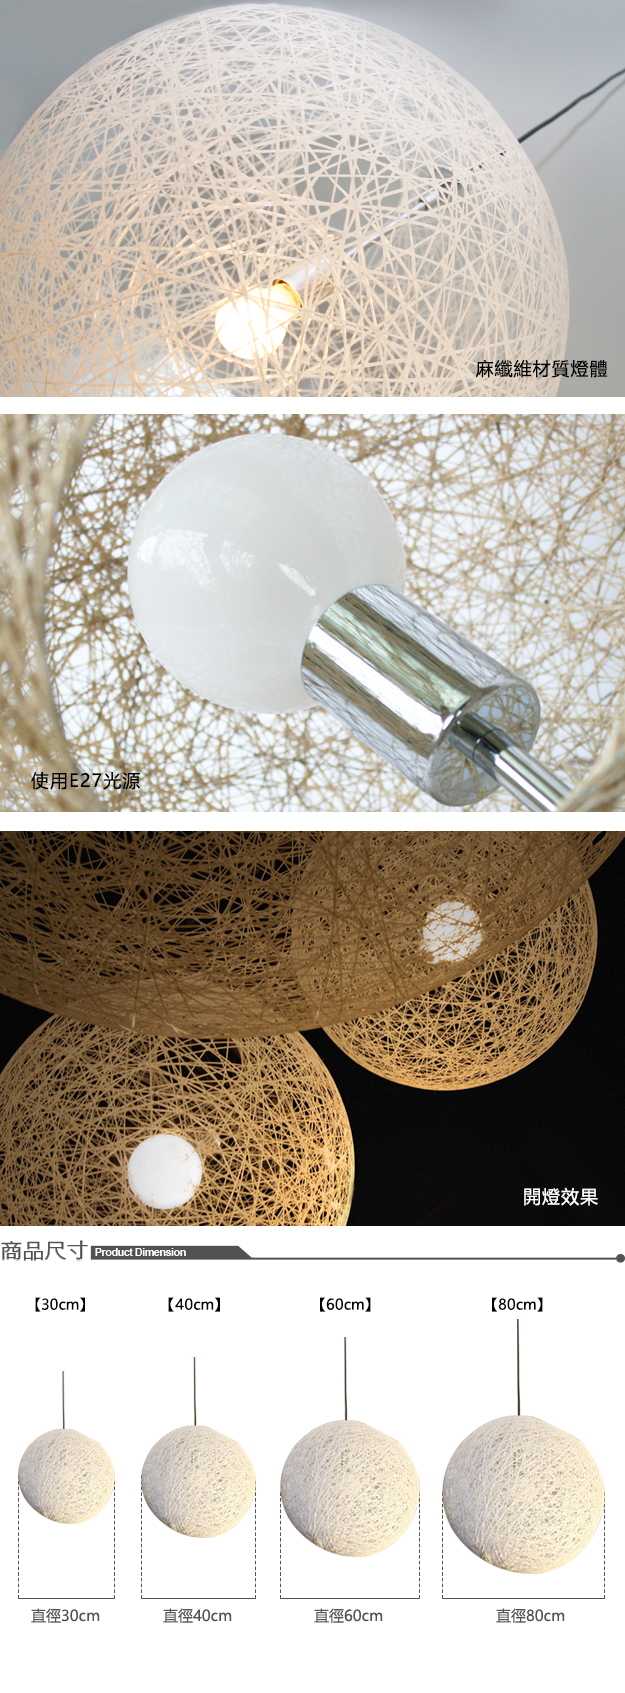 【18Park】線體結構 Ball of twine [ 線球吊燈-60cm ]